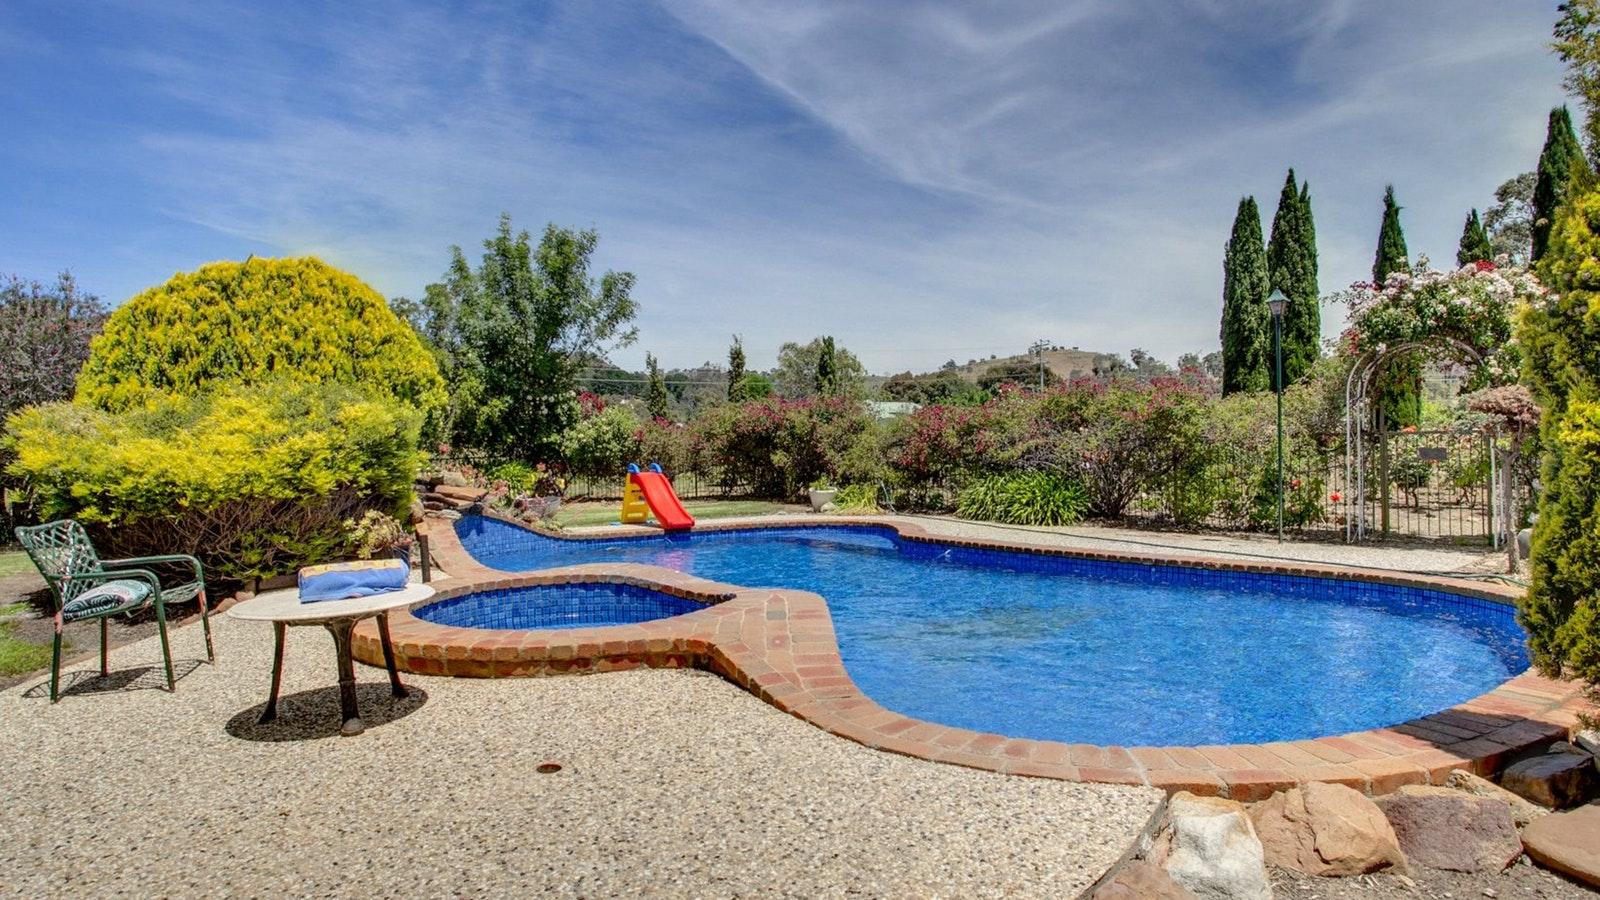 Highton Manor pool